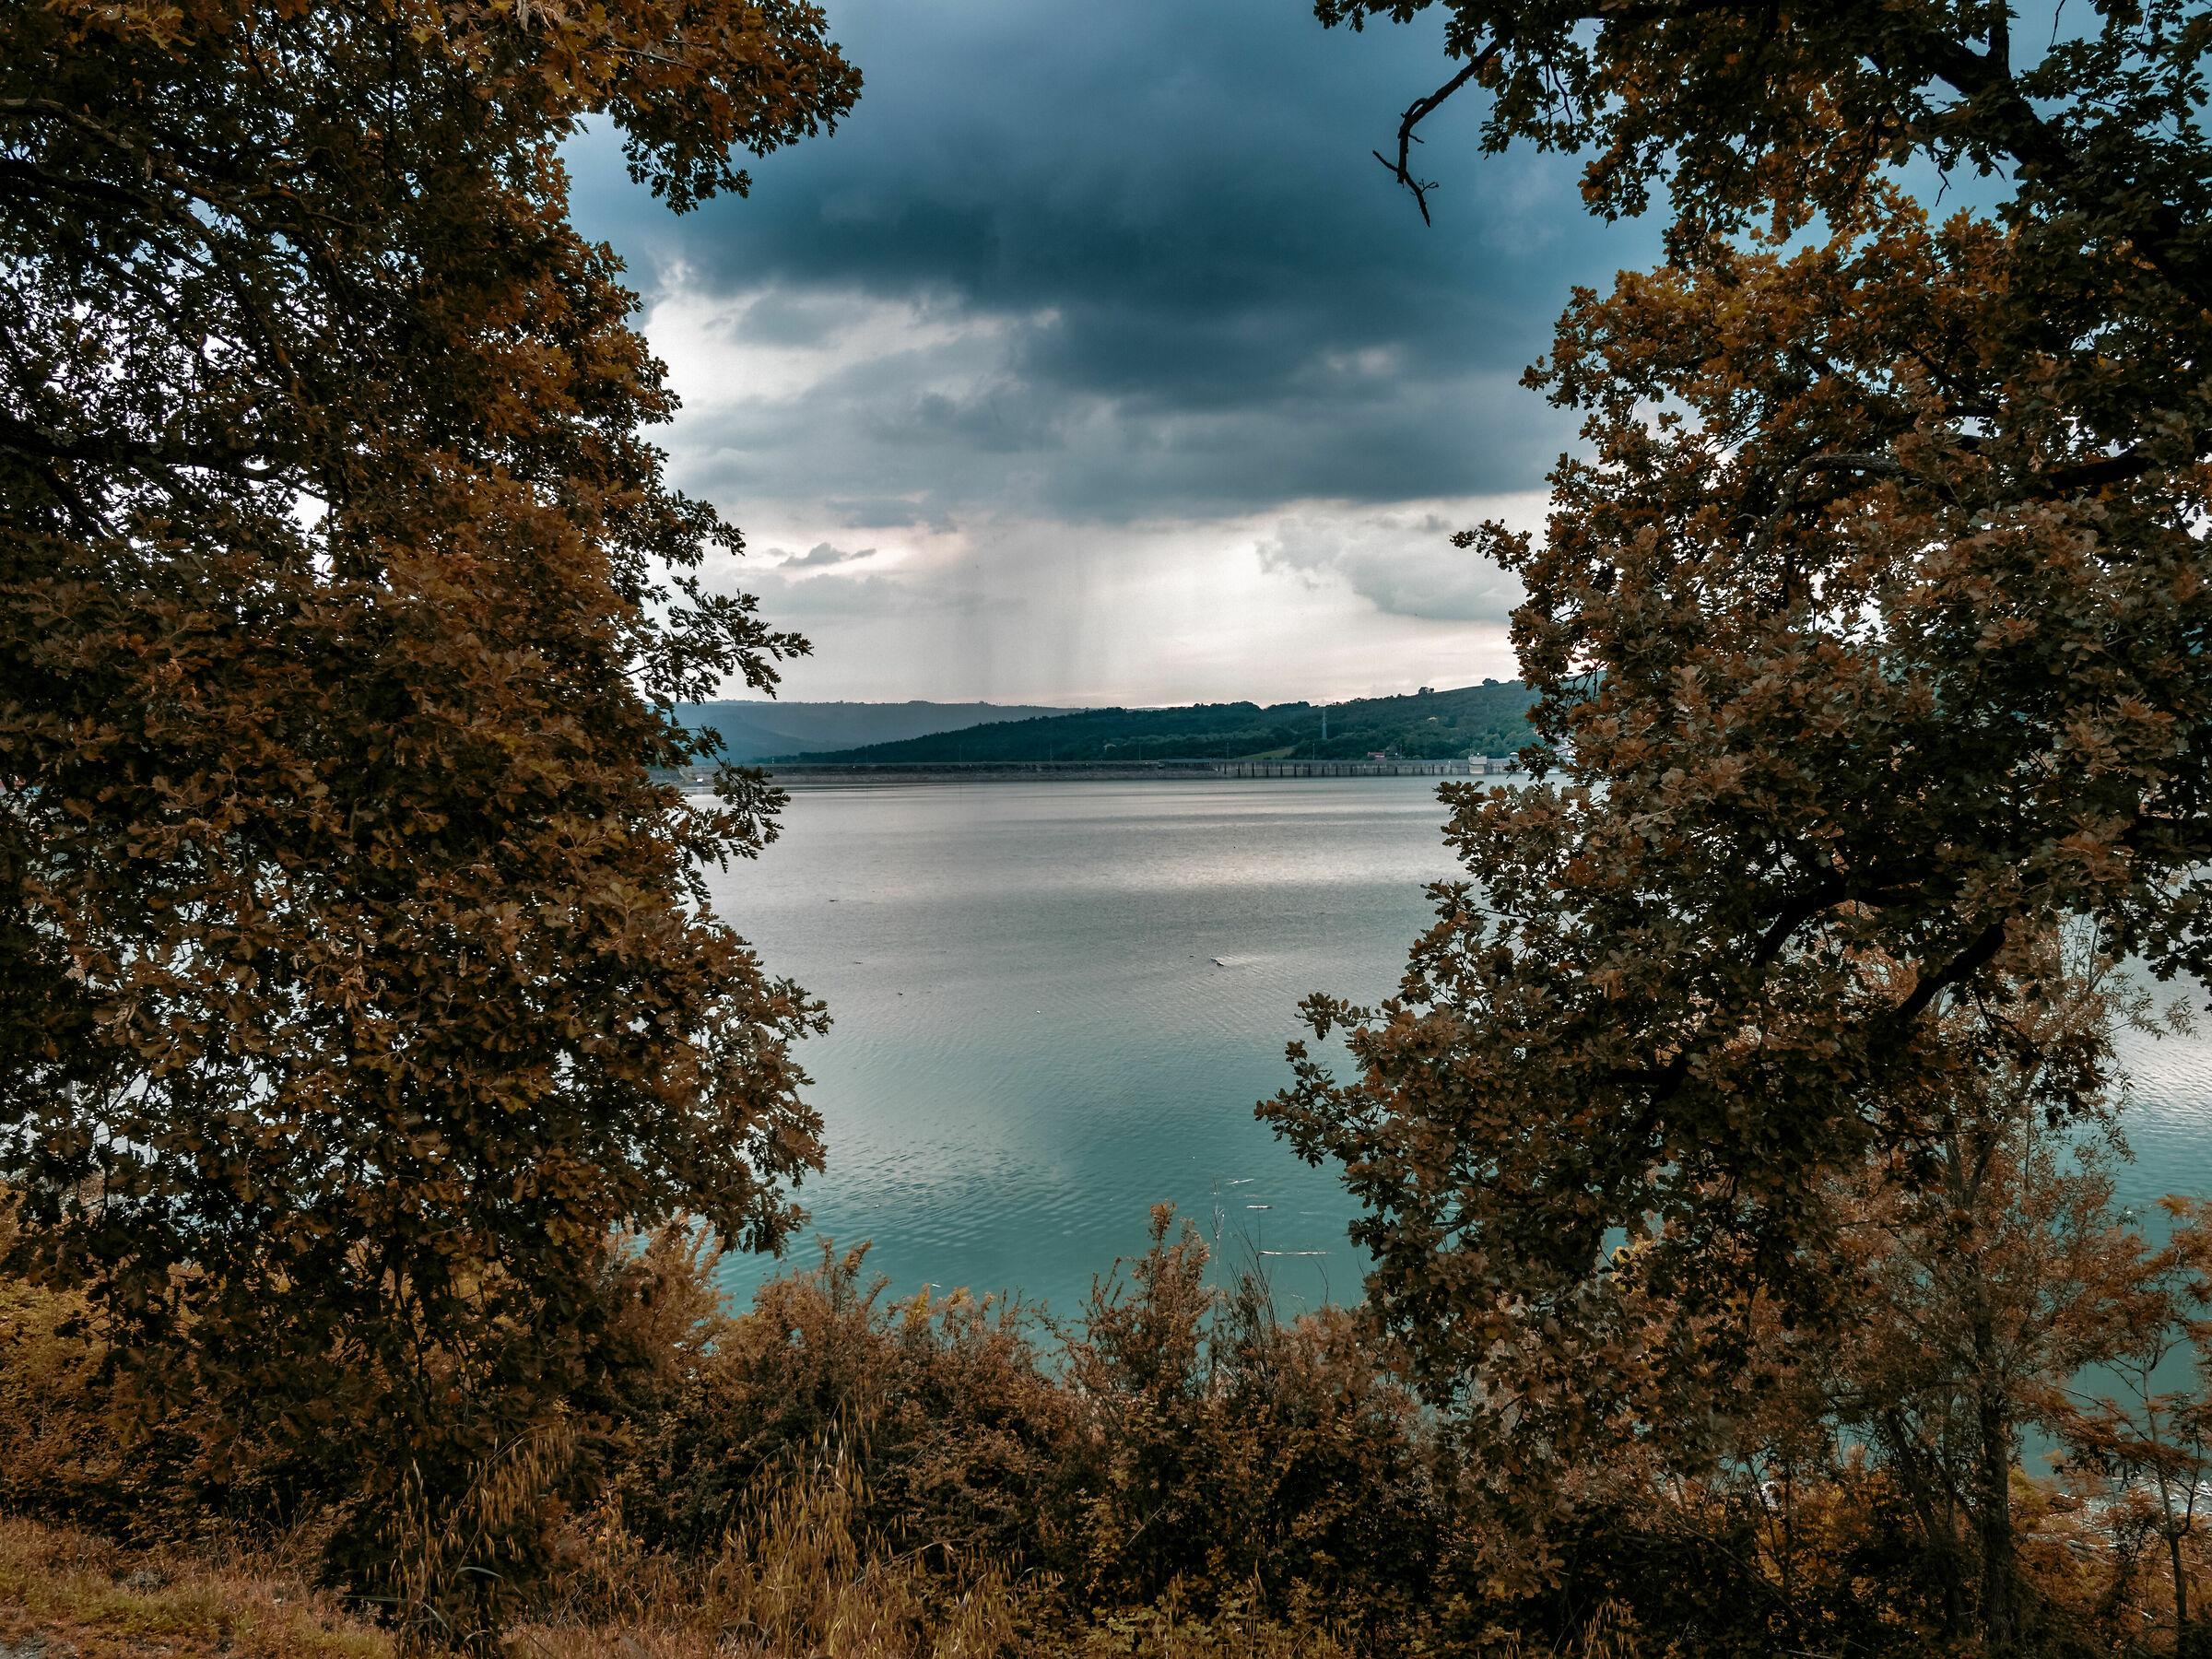 The rain over the dam...